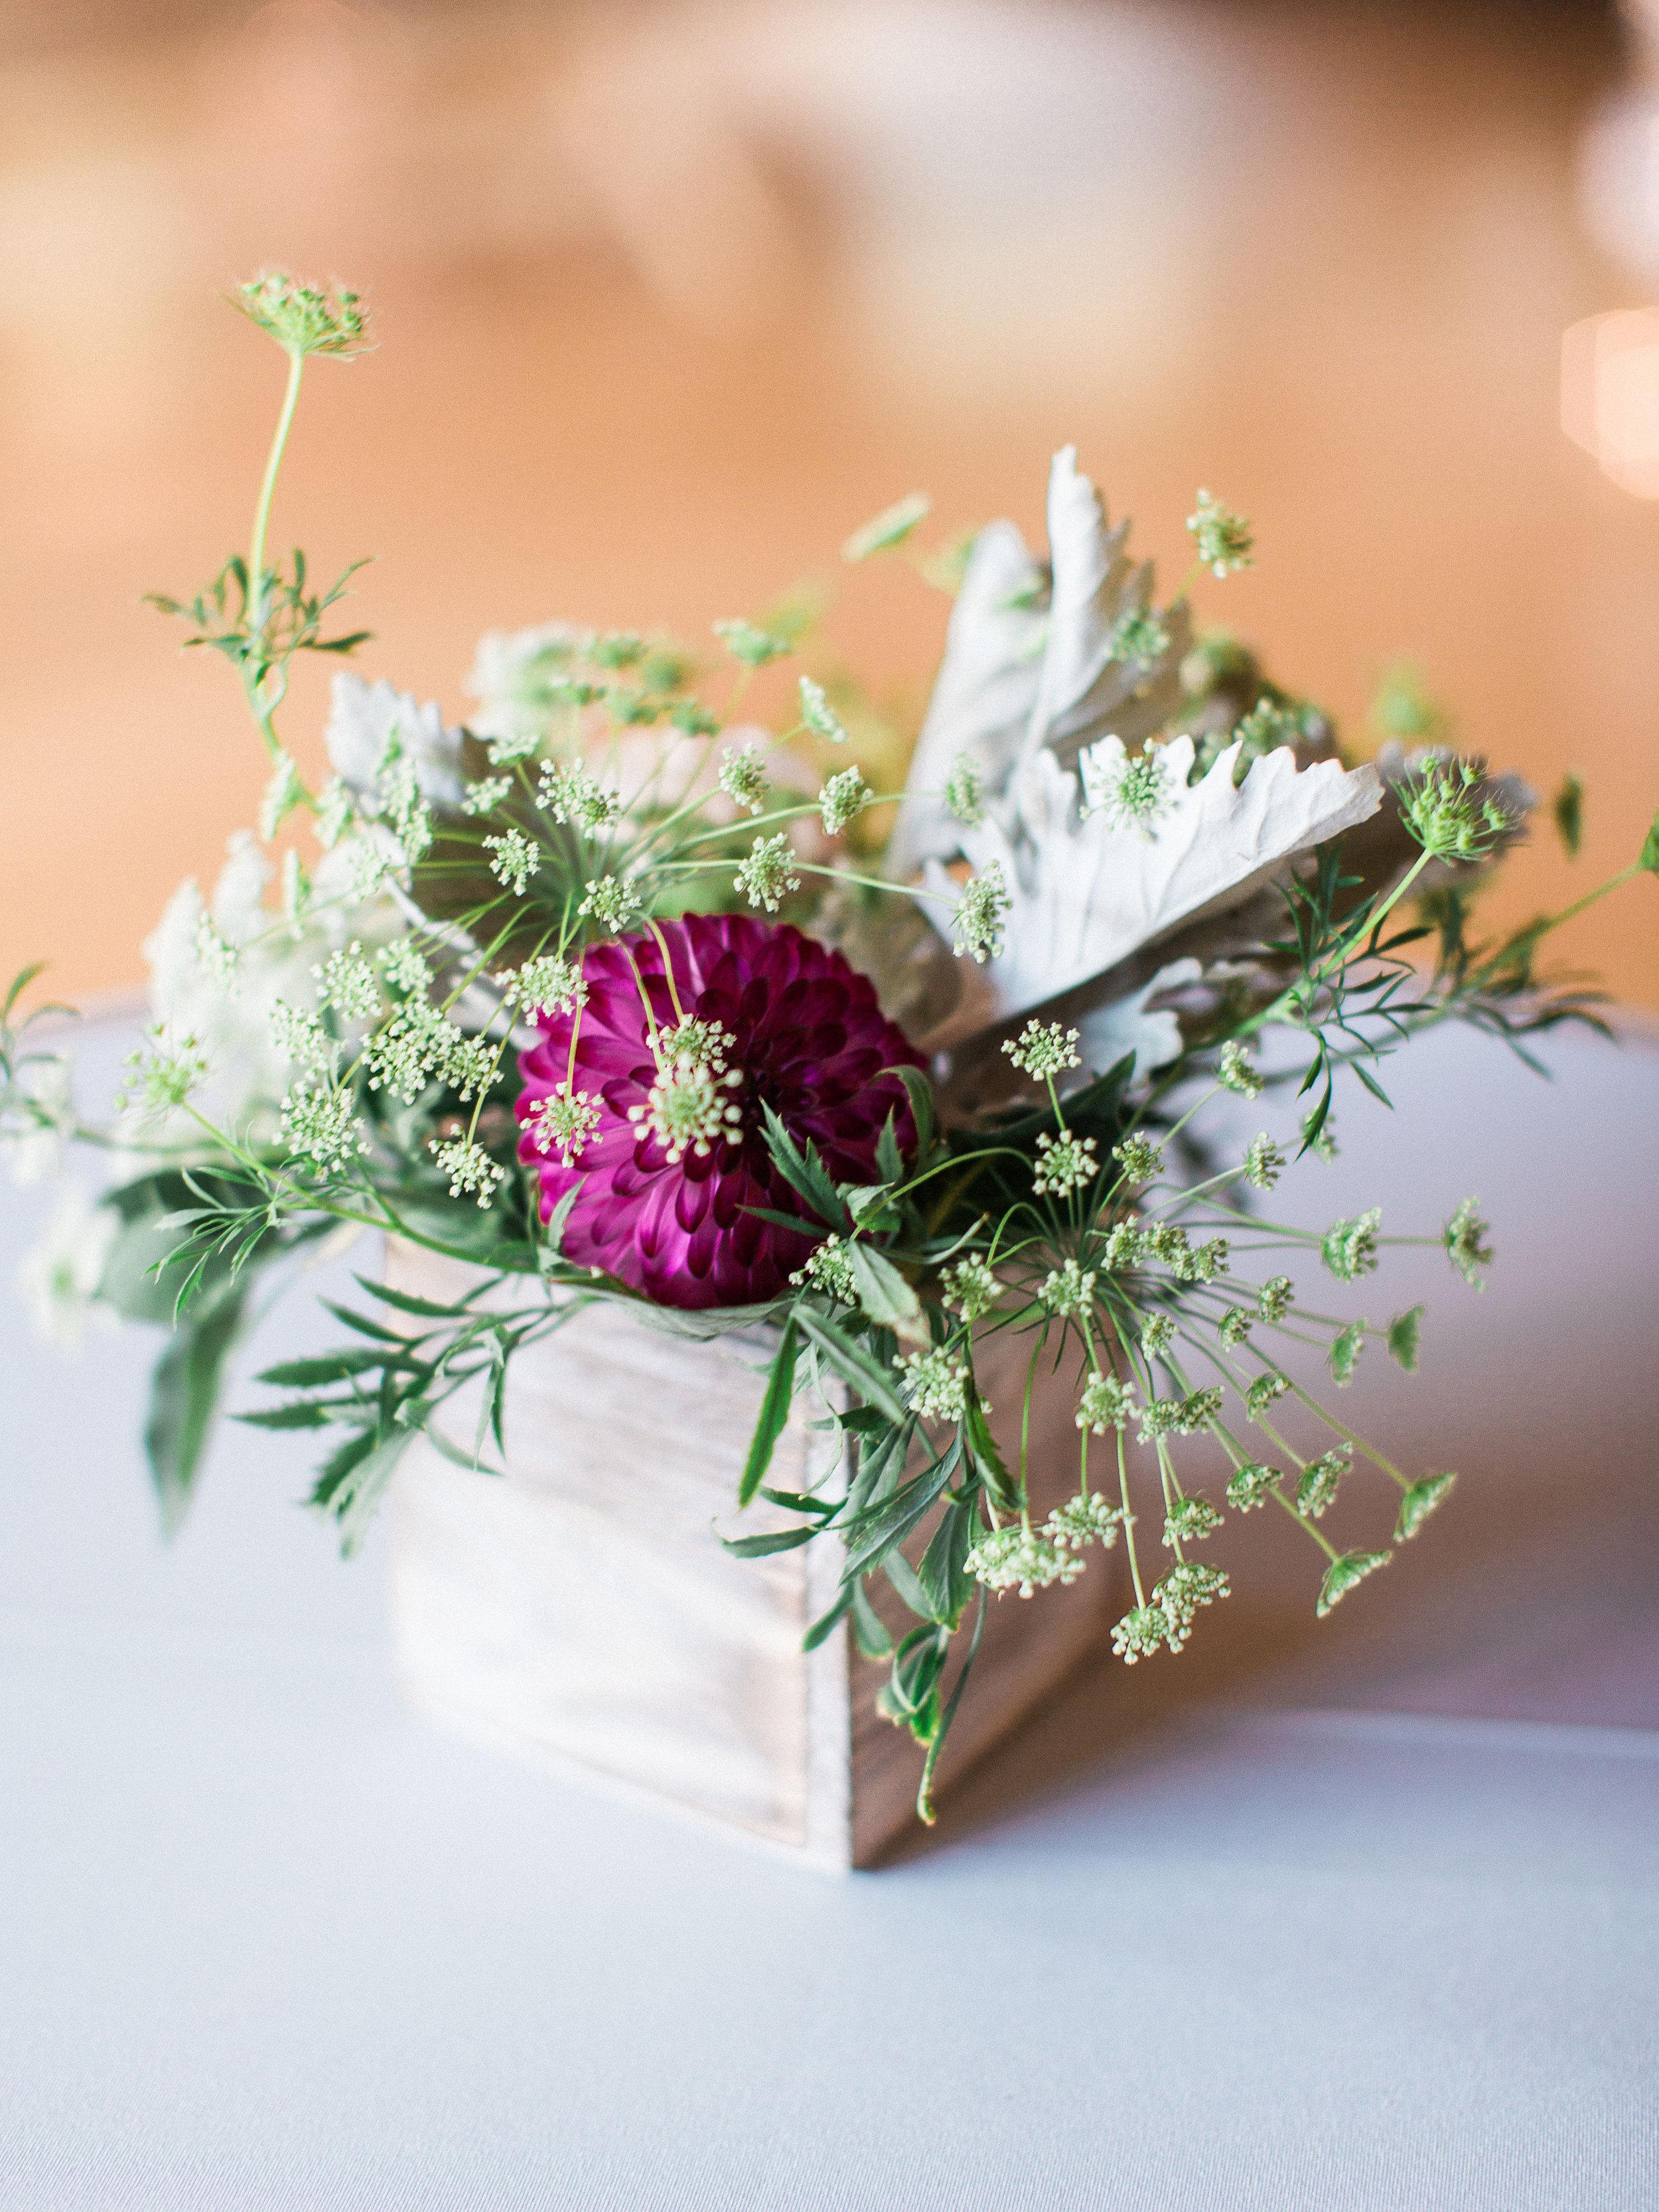 ERIC AND HALLIE WEDDING-HI RESOLUTION FOR PRINTING-0814.jpg